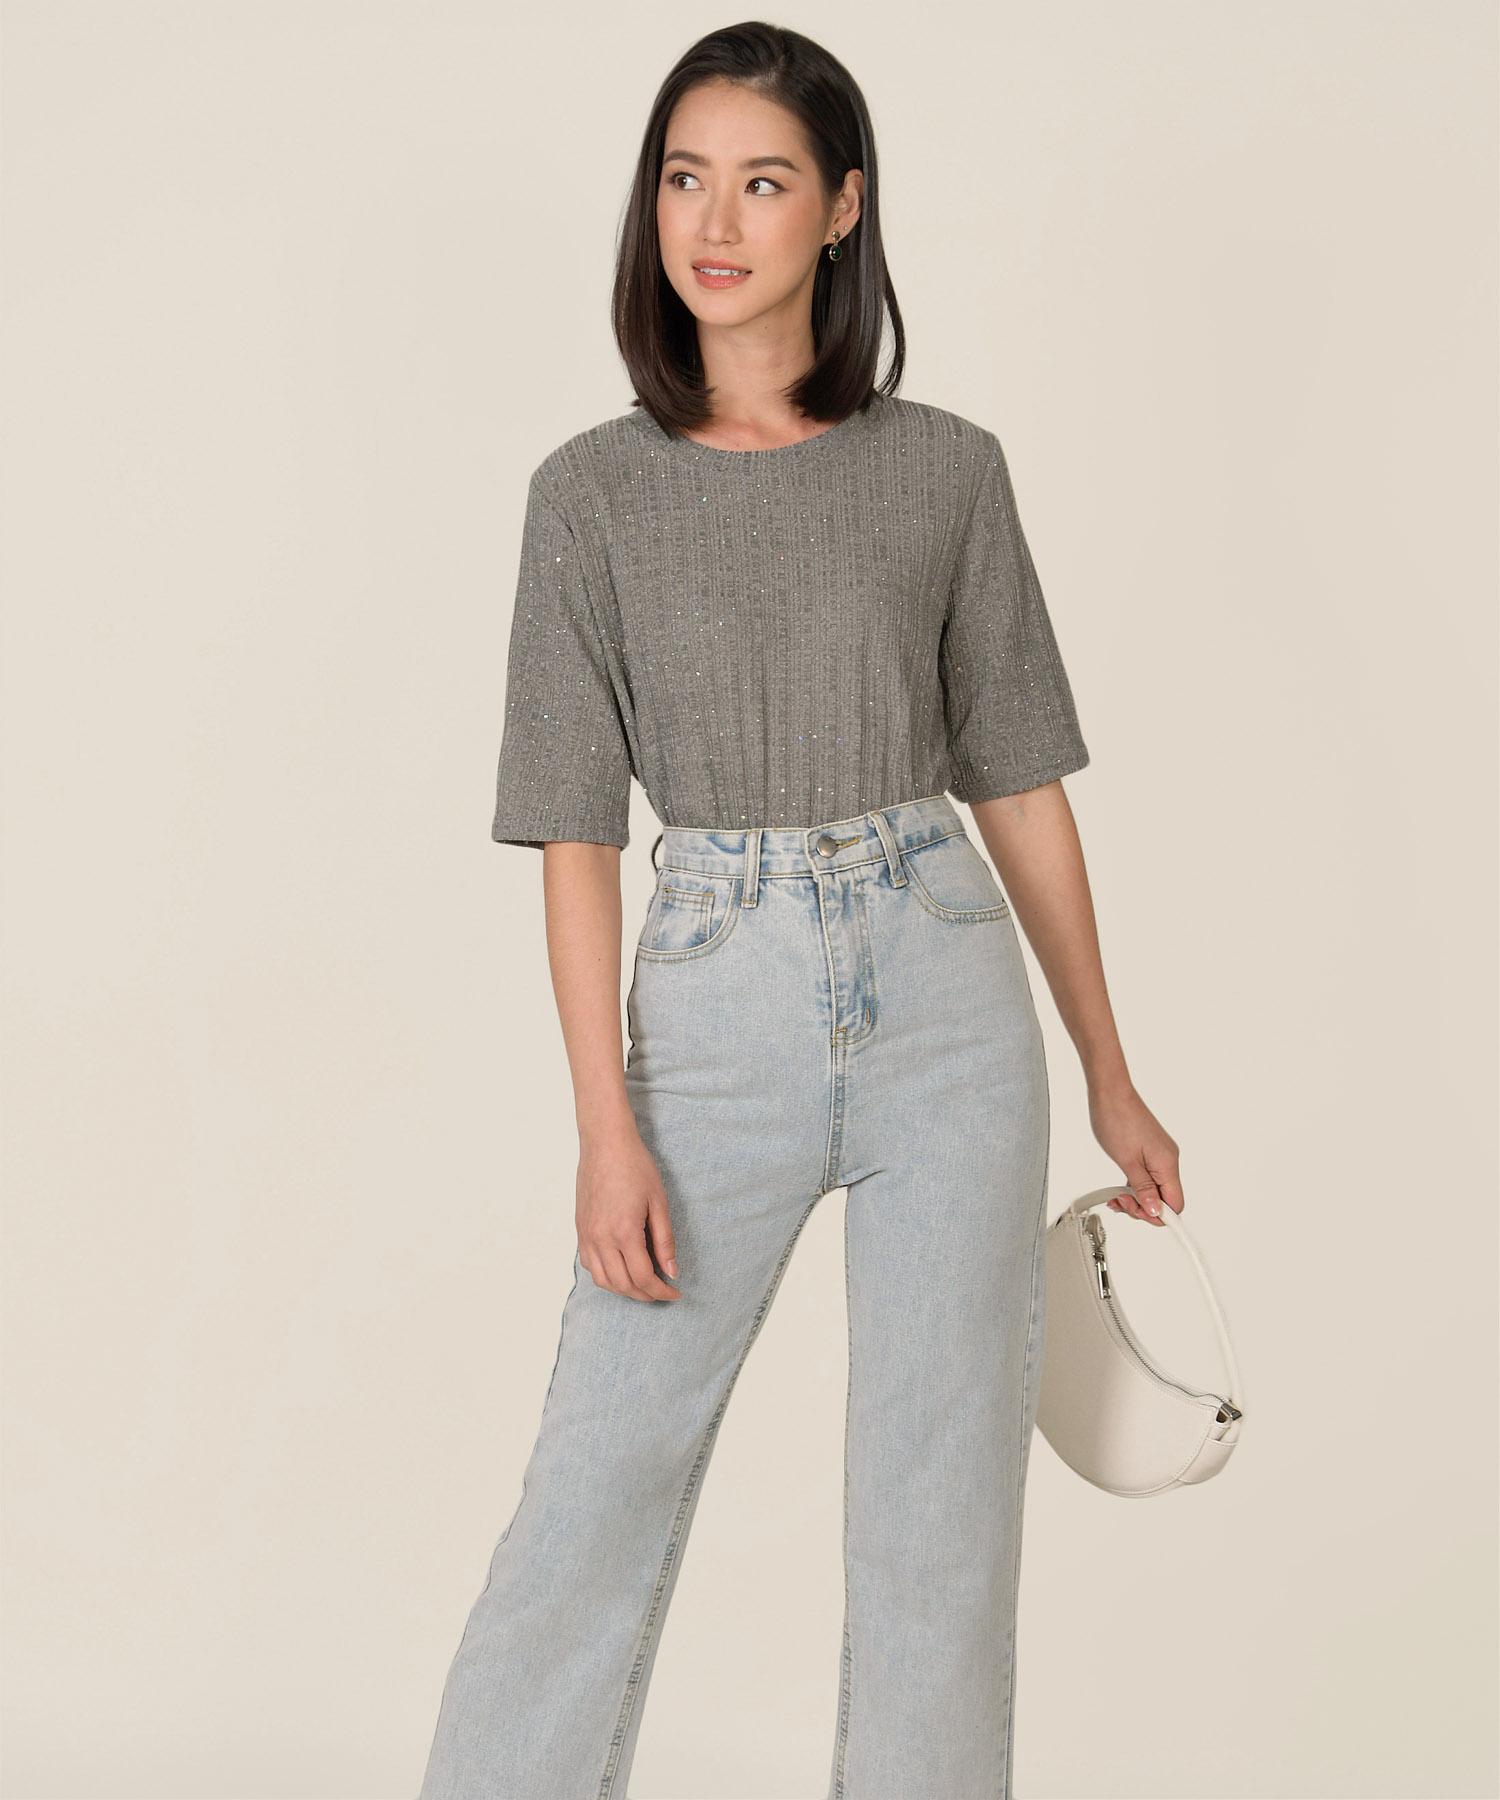 essonne-glitter-knit-top-grey-1